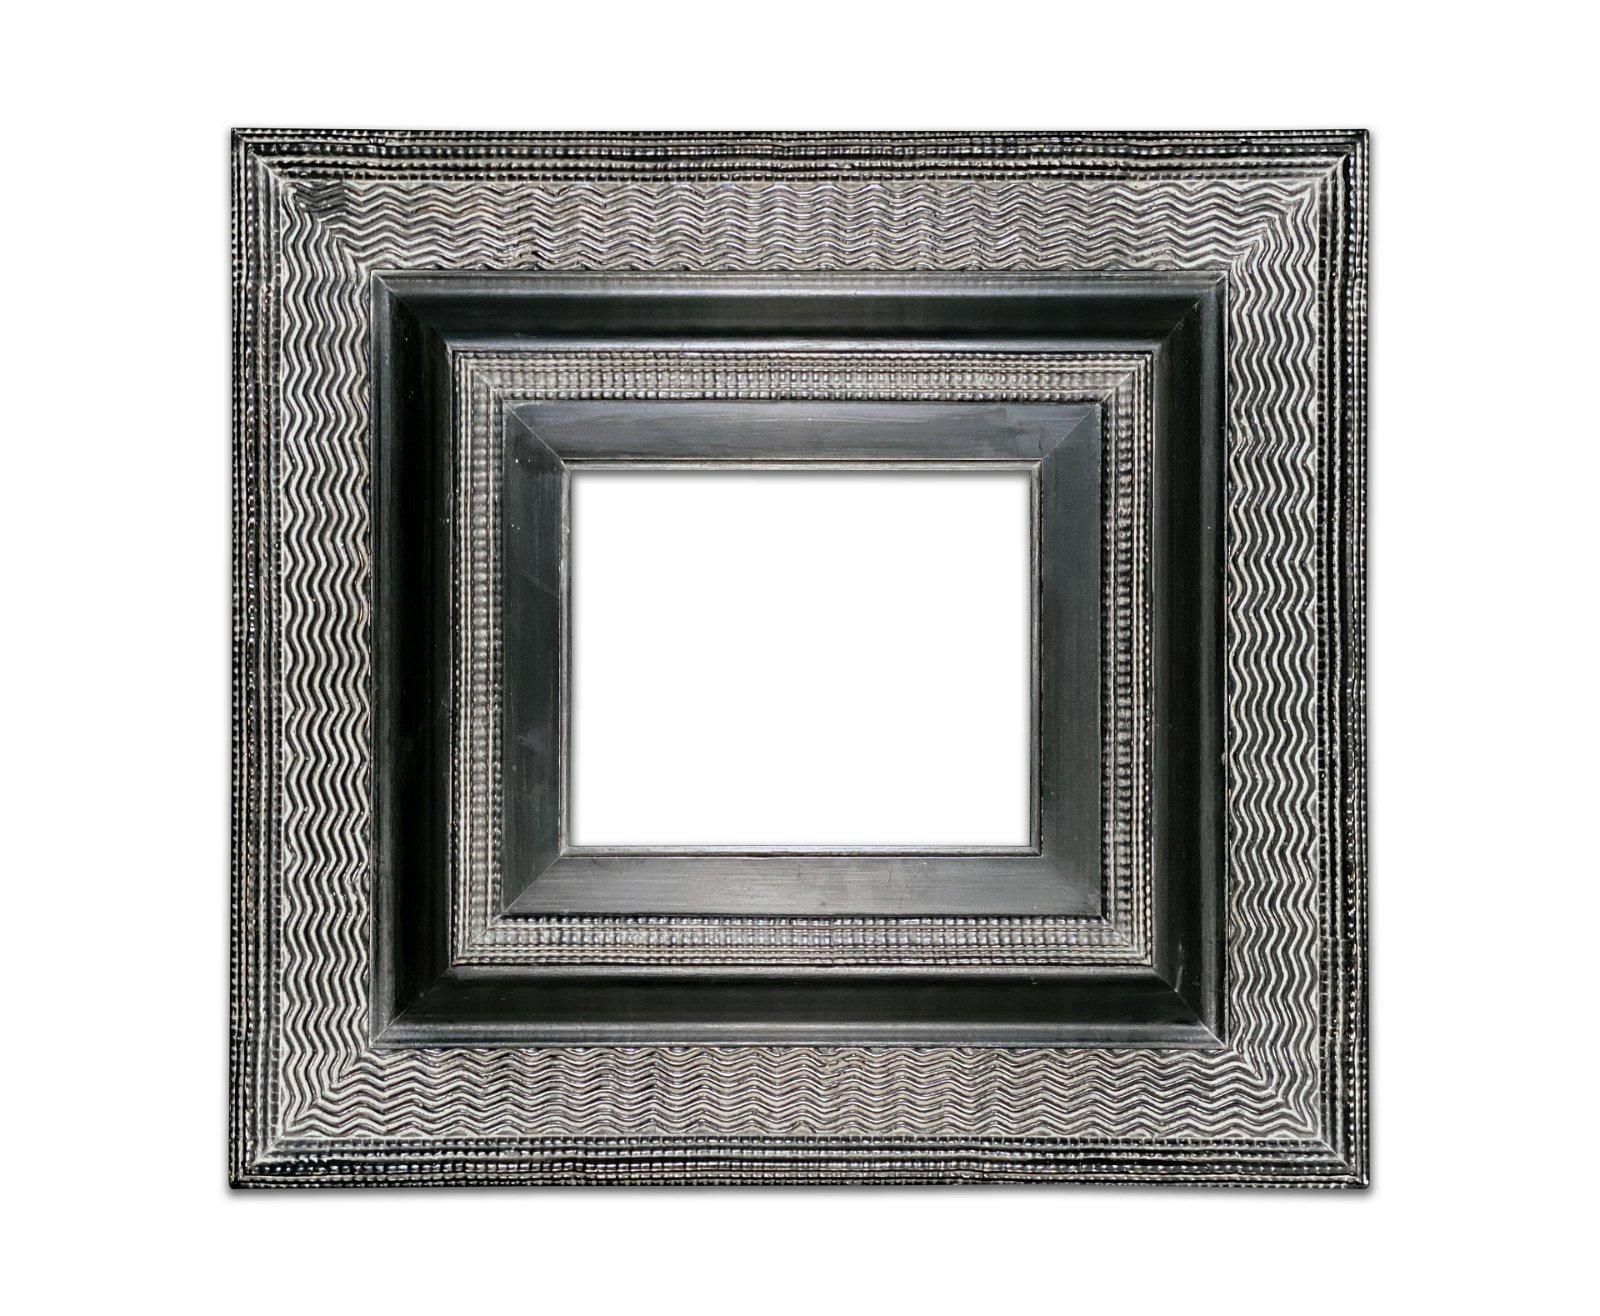 Eli Wilner Frame, Dutch 19th c. Style Ex Magritte